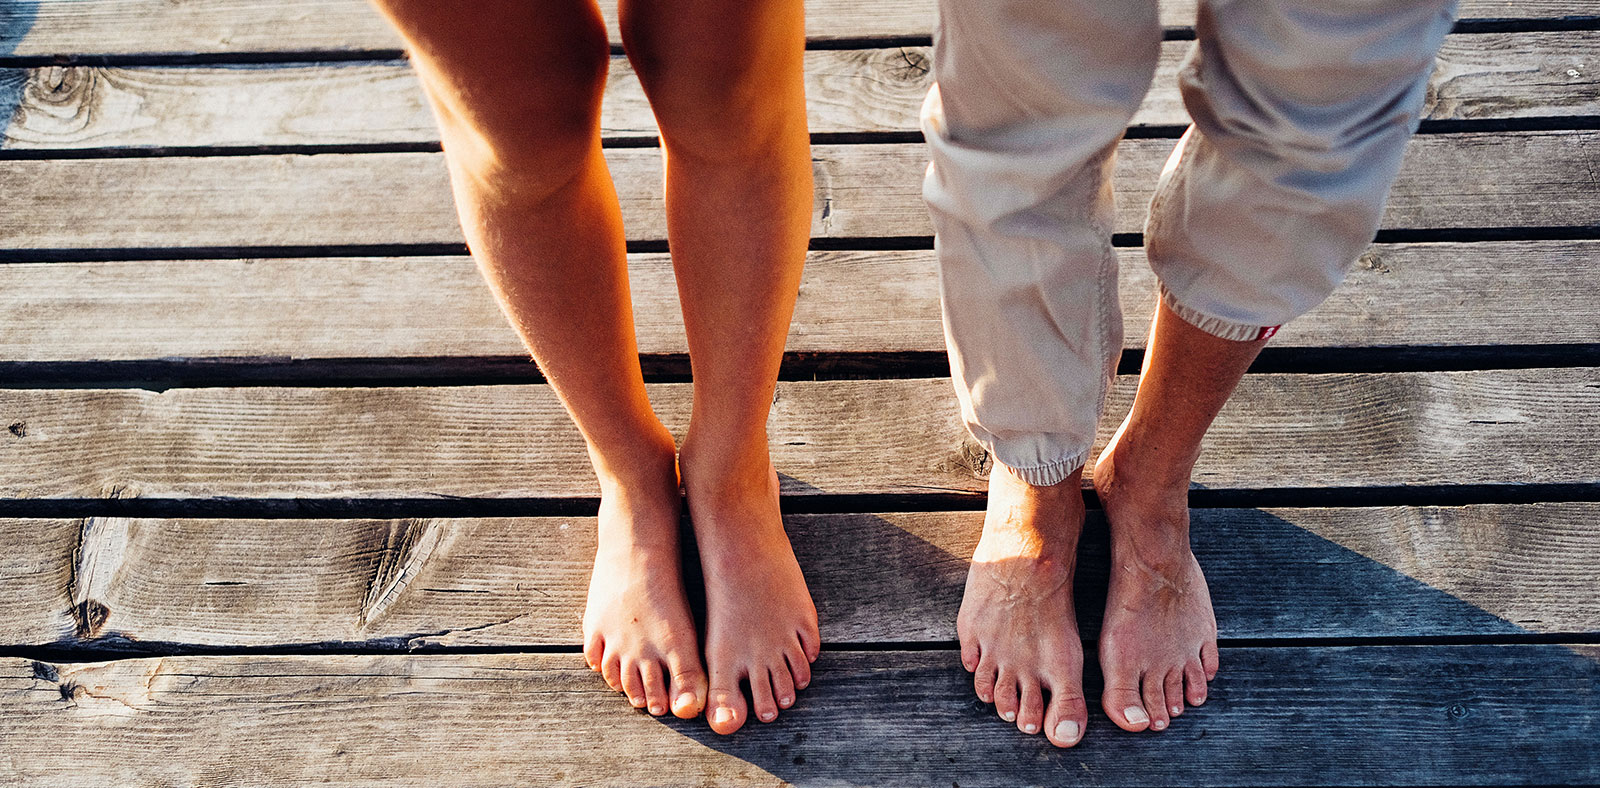 Slider Karins und Lenas Füße - Barfuß am Steg